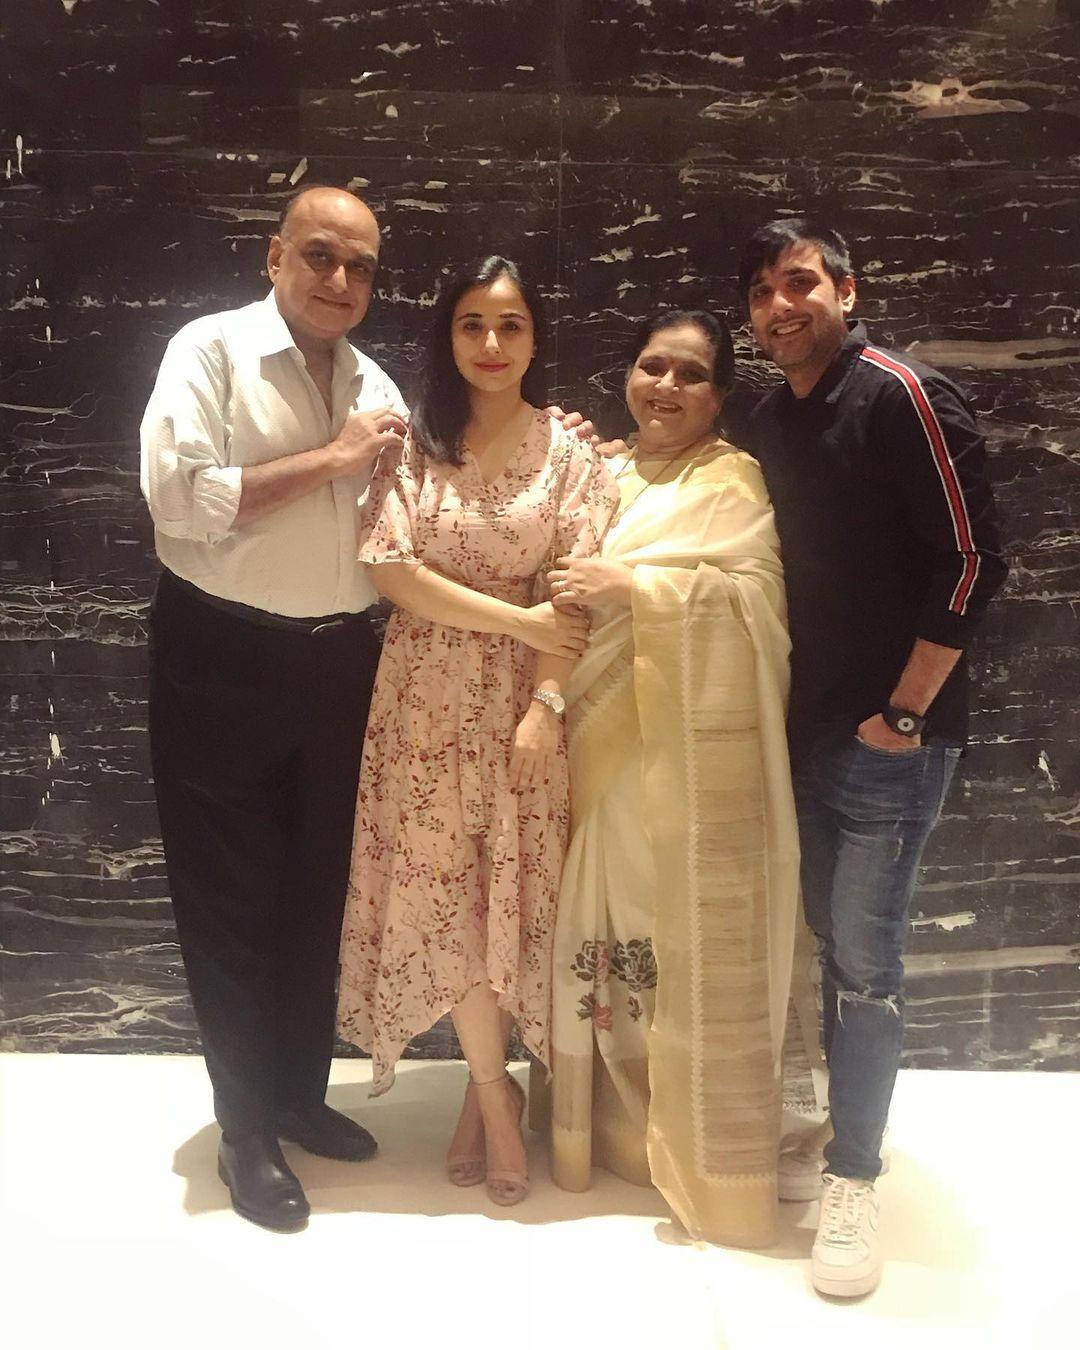 Tarun Kumar Bio, Age, Family, Career, Education,Net Worth and Instagram